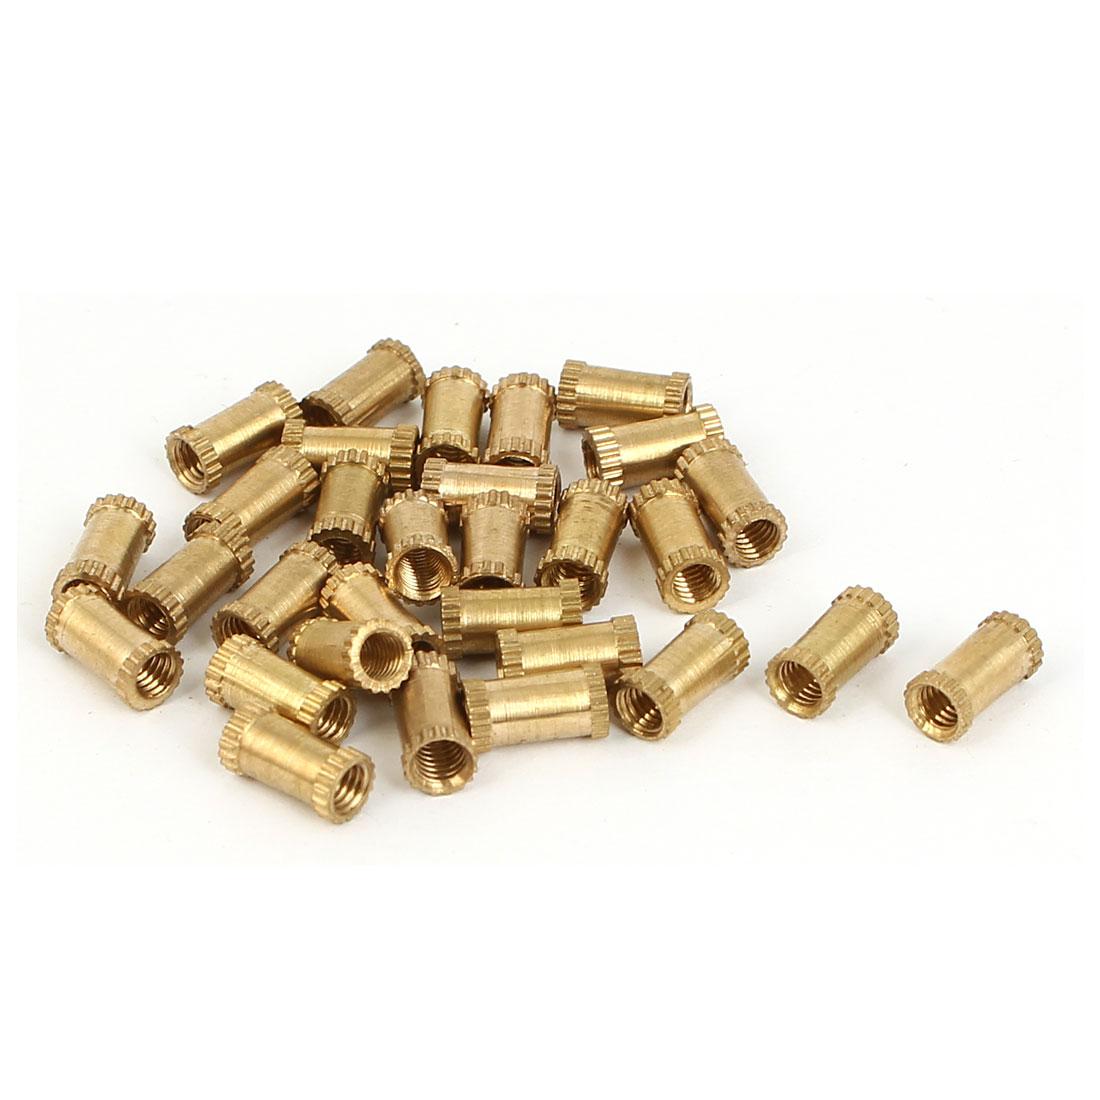 M3 x 4mm x 8mm Female Threaded Insert Embedded Brass Knurled Nuts Gold Tone 30 Pcs